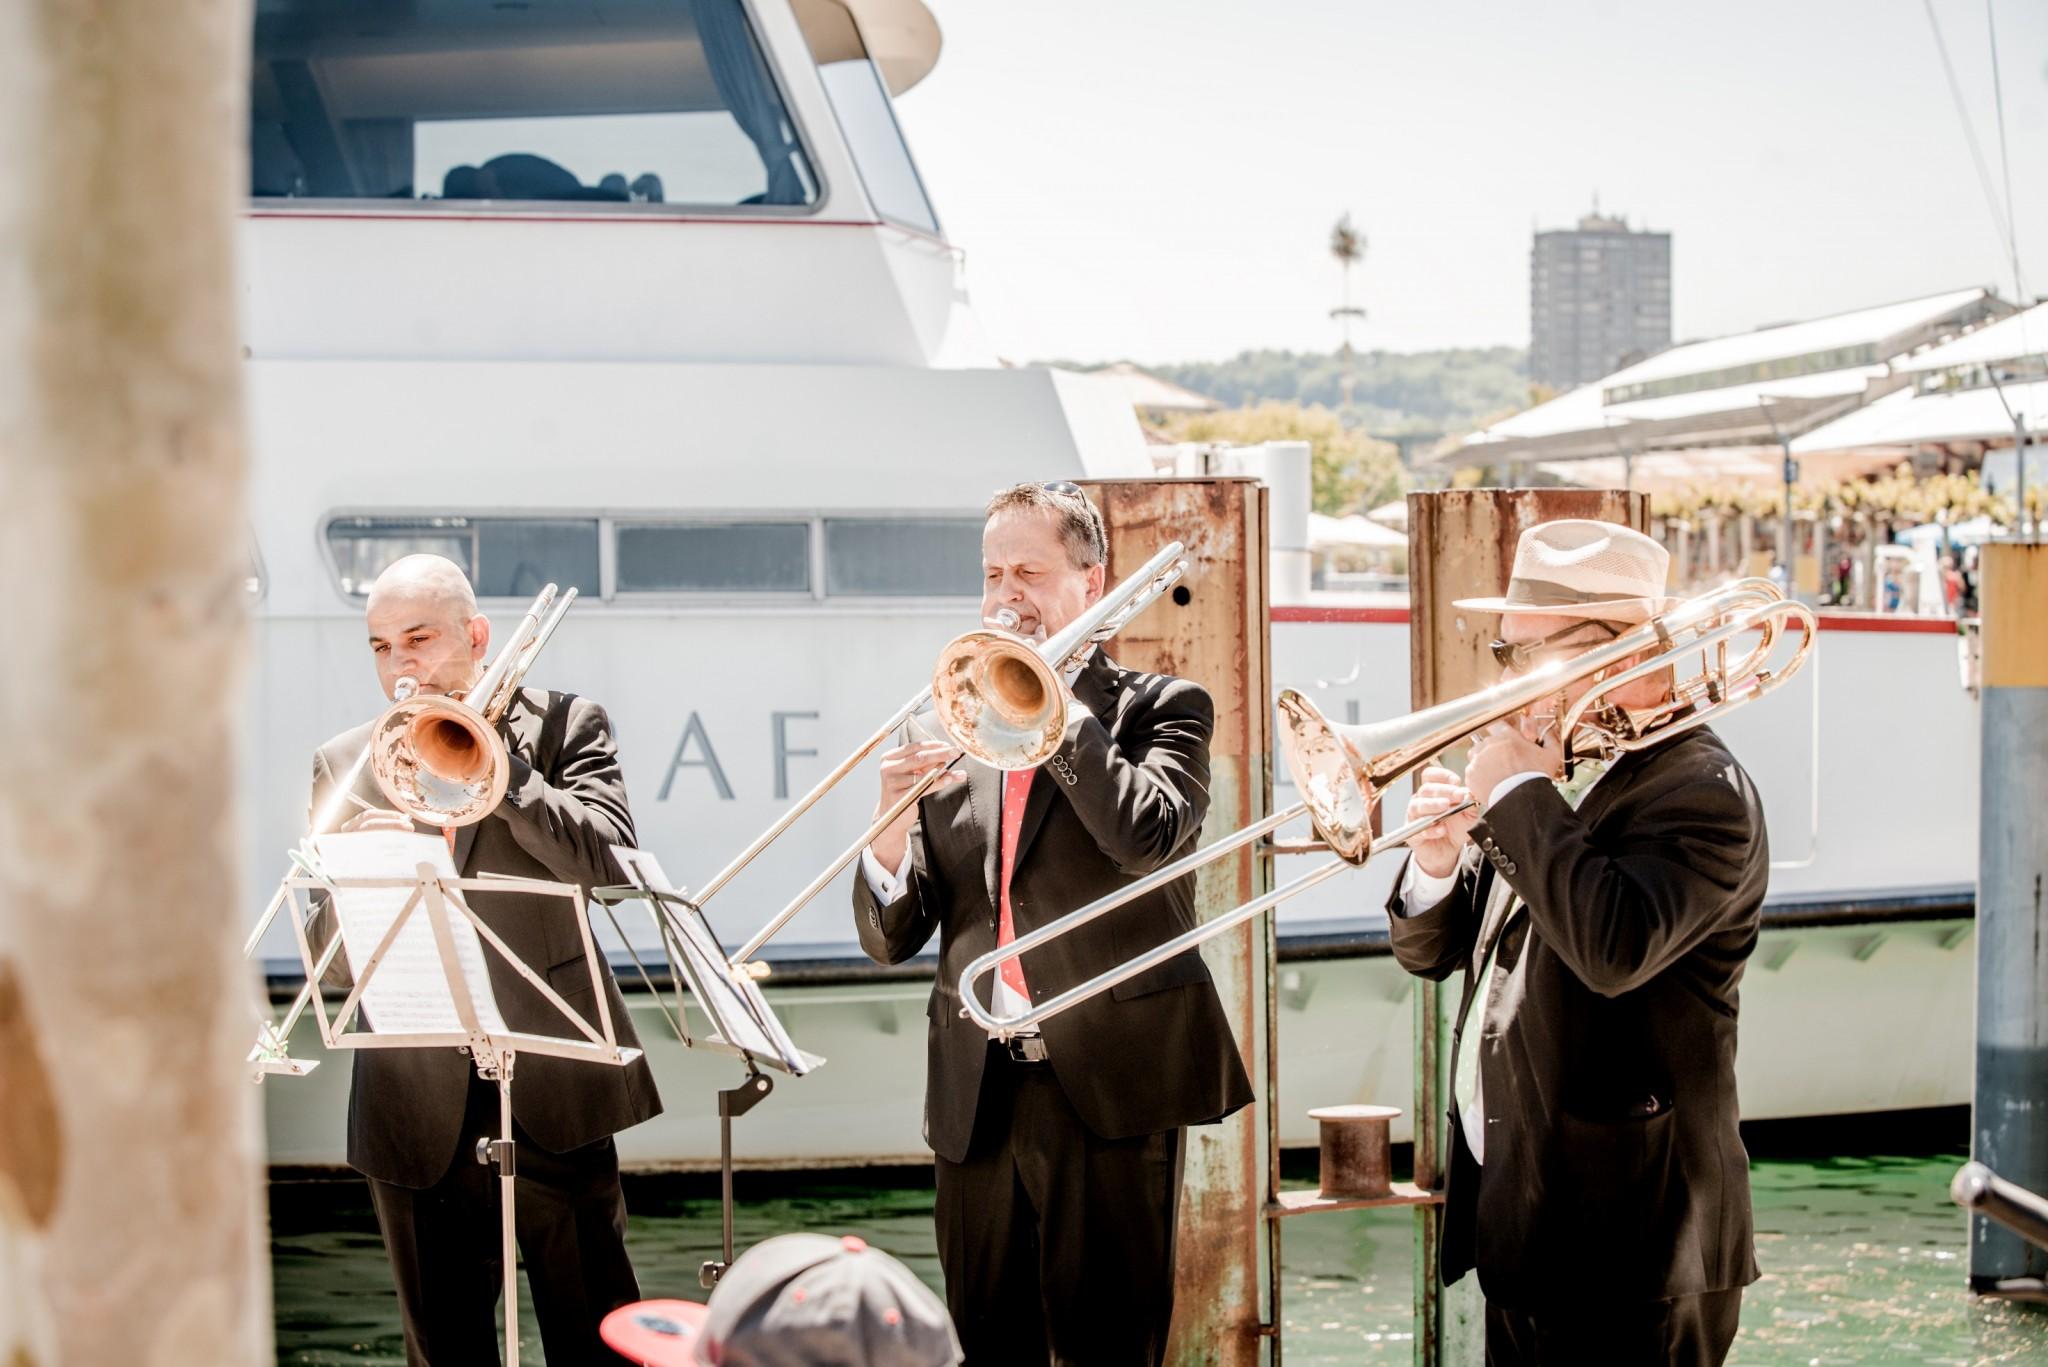 19-06-02 KN_Musik an Bord_c_Victor Marin Roman (3)